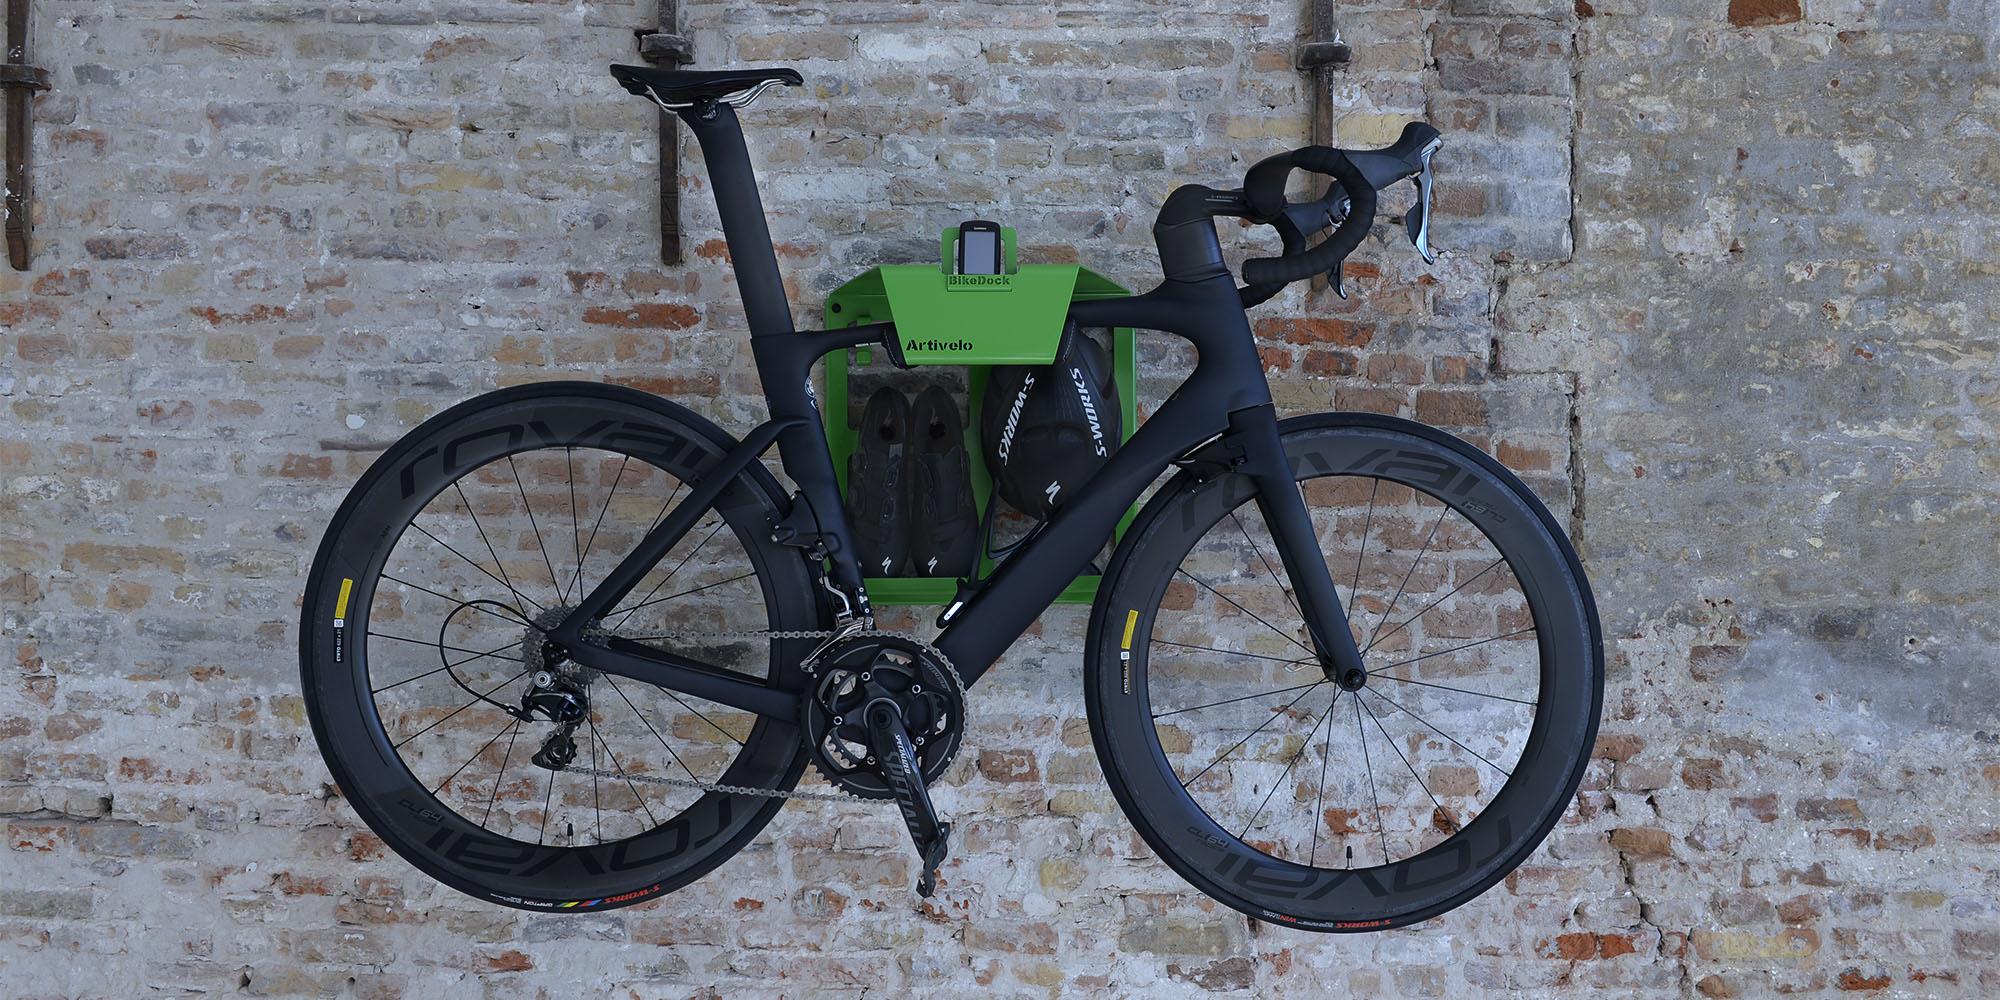 https://artivelo.com/english/wp-content/uploads/2016/07/Artivelo-BikeDock-Tour-de-France-green-trui-green-jersey-fiets-ophangsysteem-racefiets-ophangen-muur-muurbeugel-Bike-Wall-Mount-bike-storage-bicycle-storage-Road-bike-hanging-wall.jpg